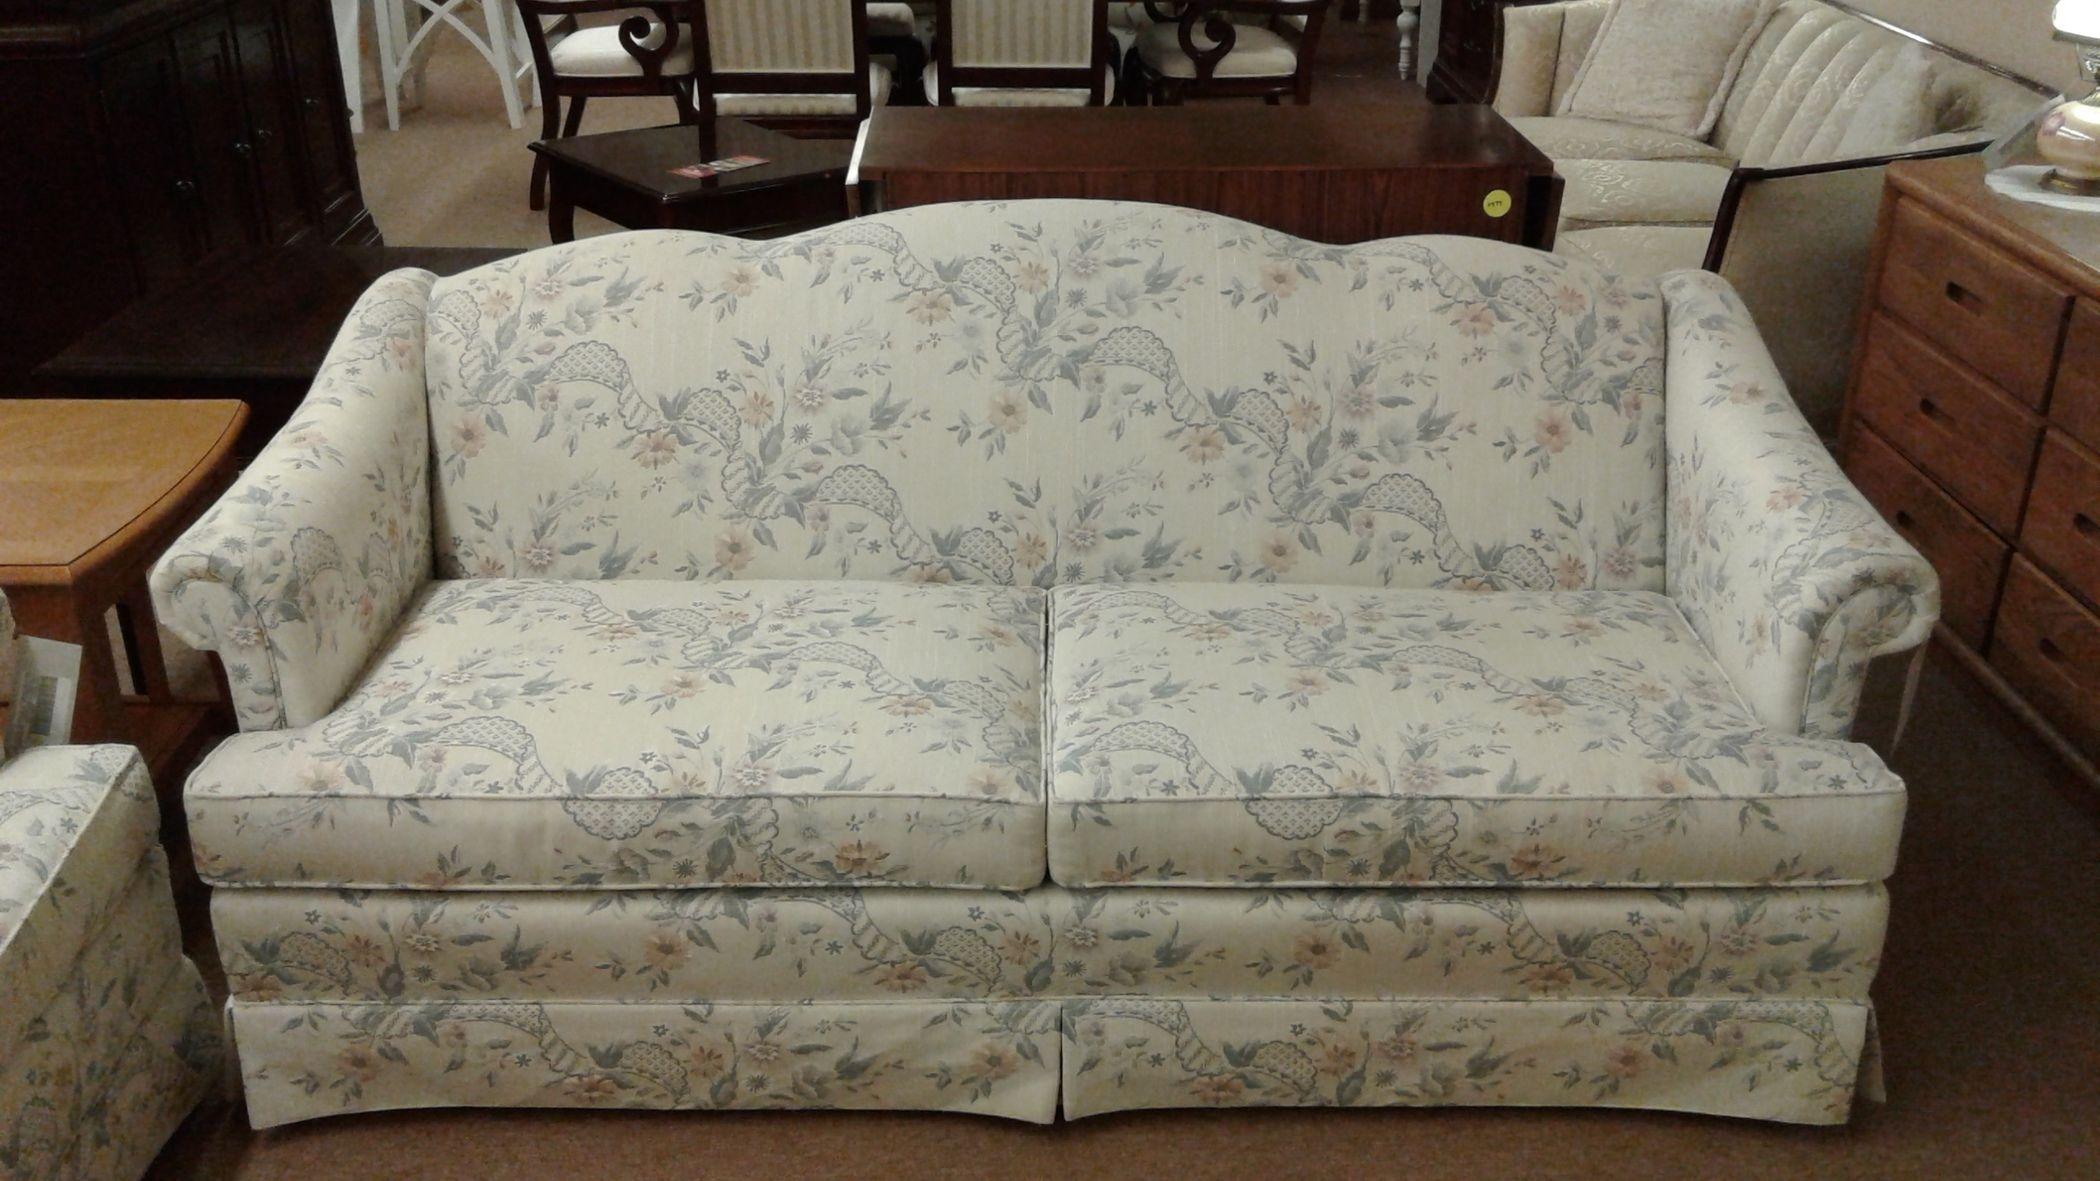 THOMASVILLE CAMEL BACK SOFA Delmarva Furniture Consignment